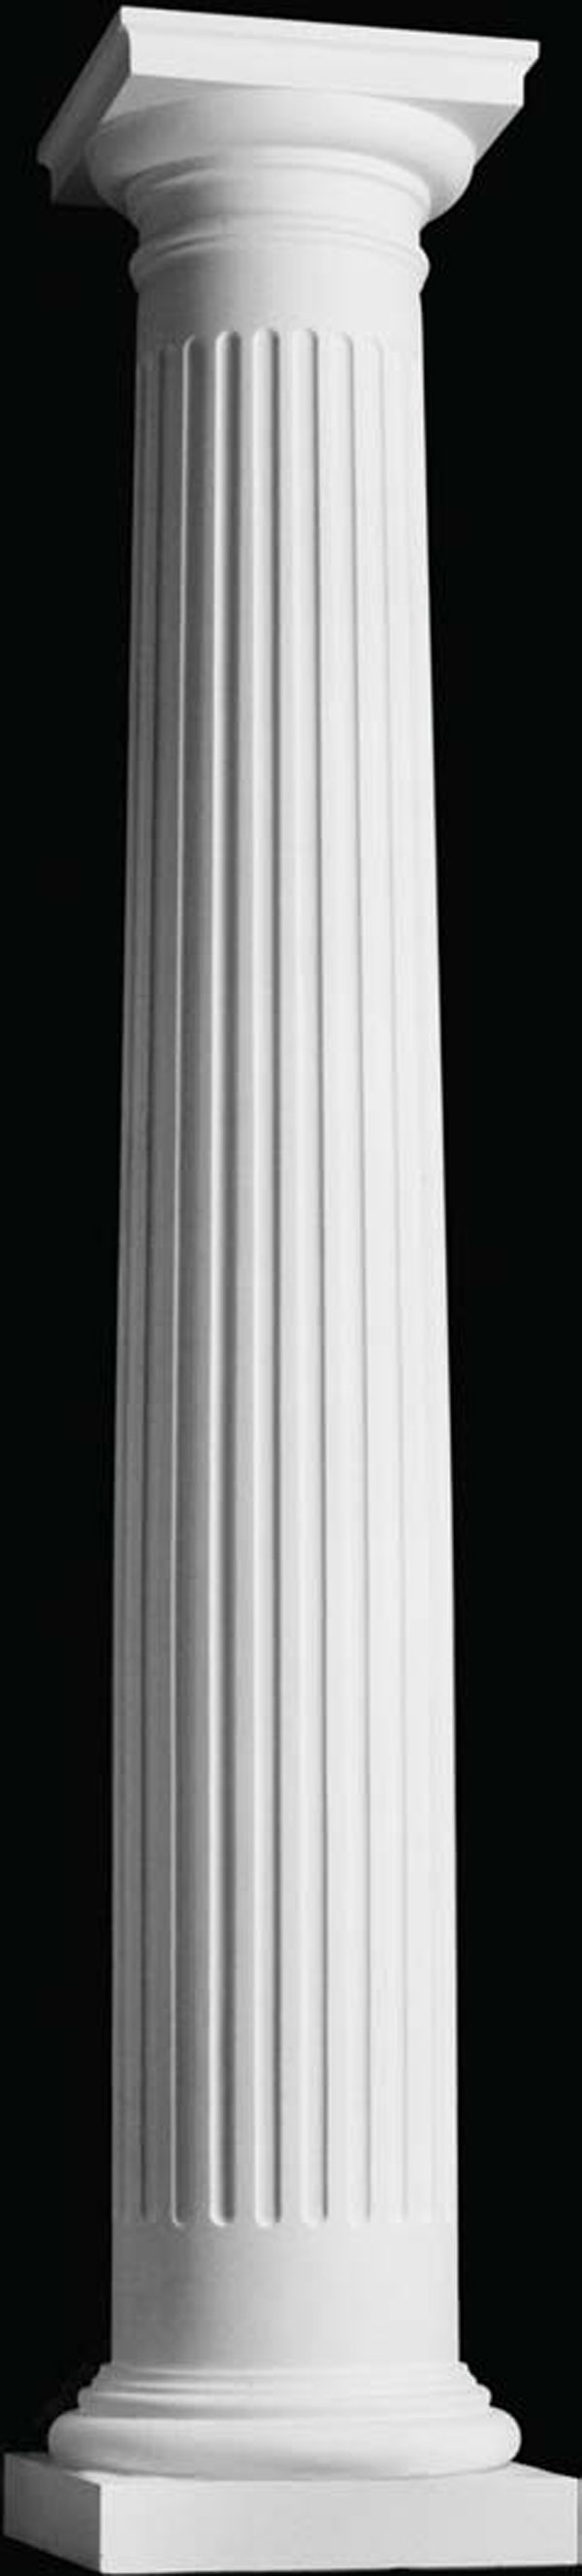 chadsworth columns photo gallery. Black Bedroom Furniture Sets. Home Design Ideas